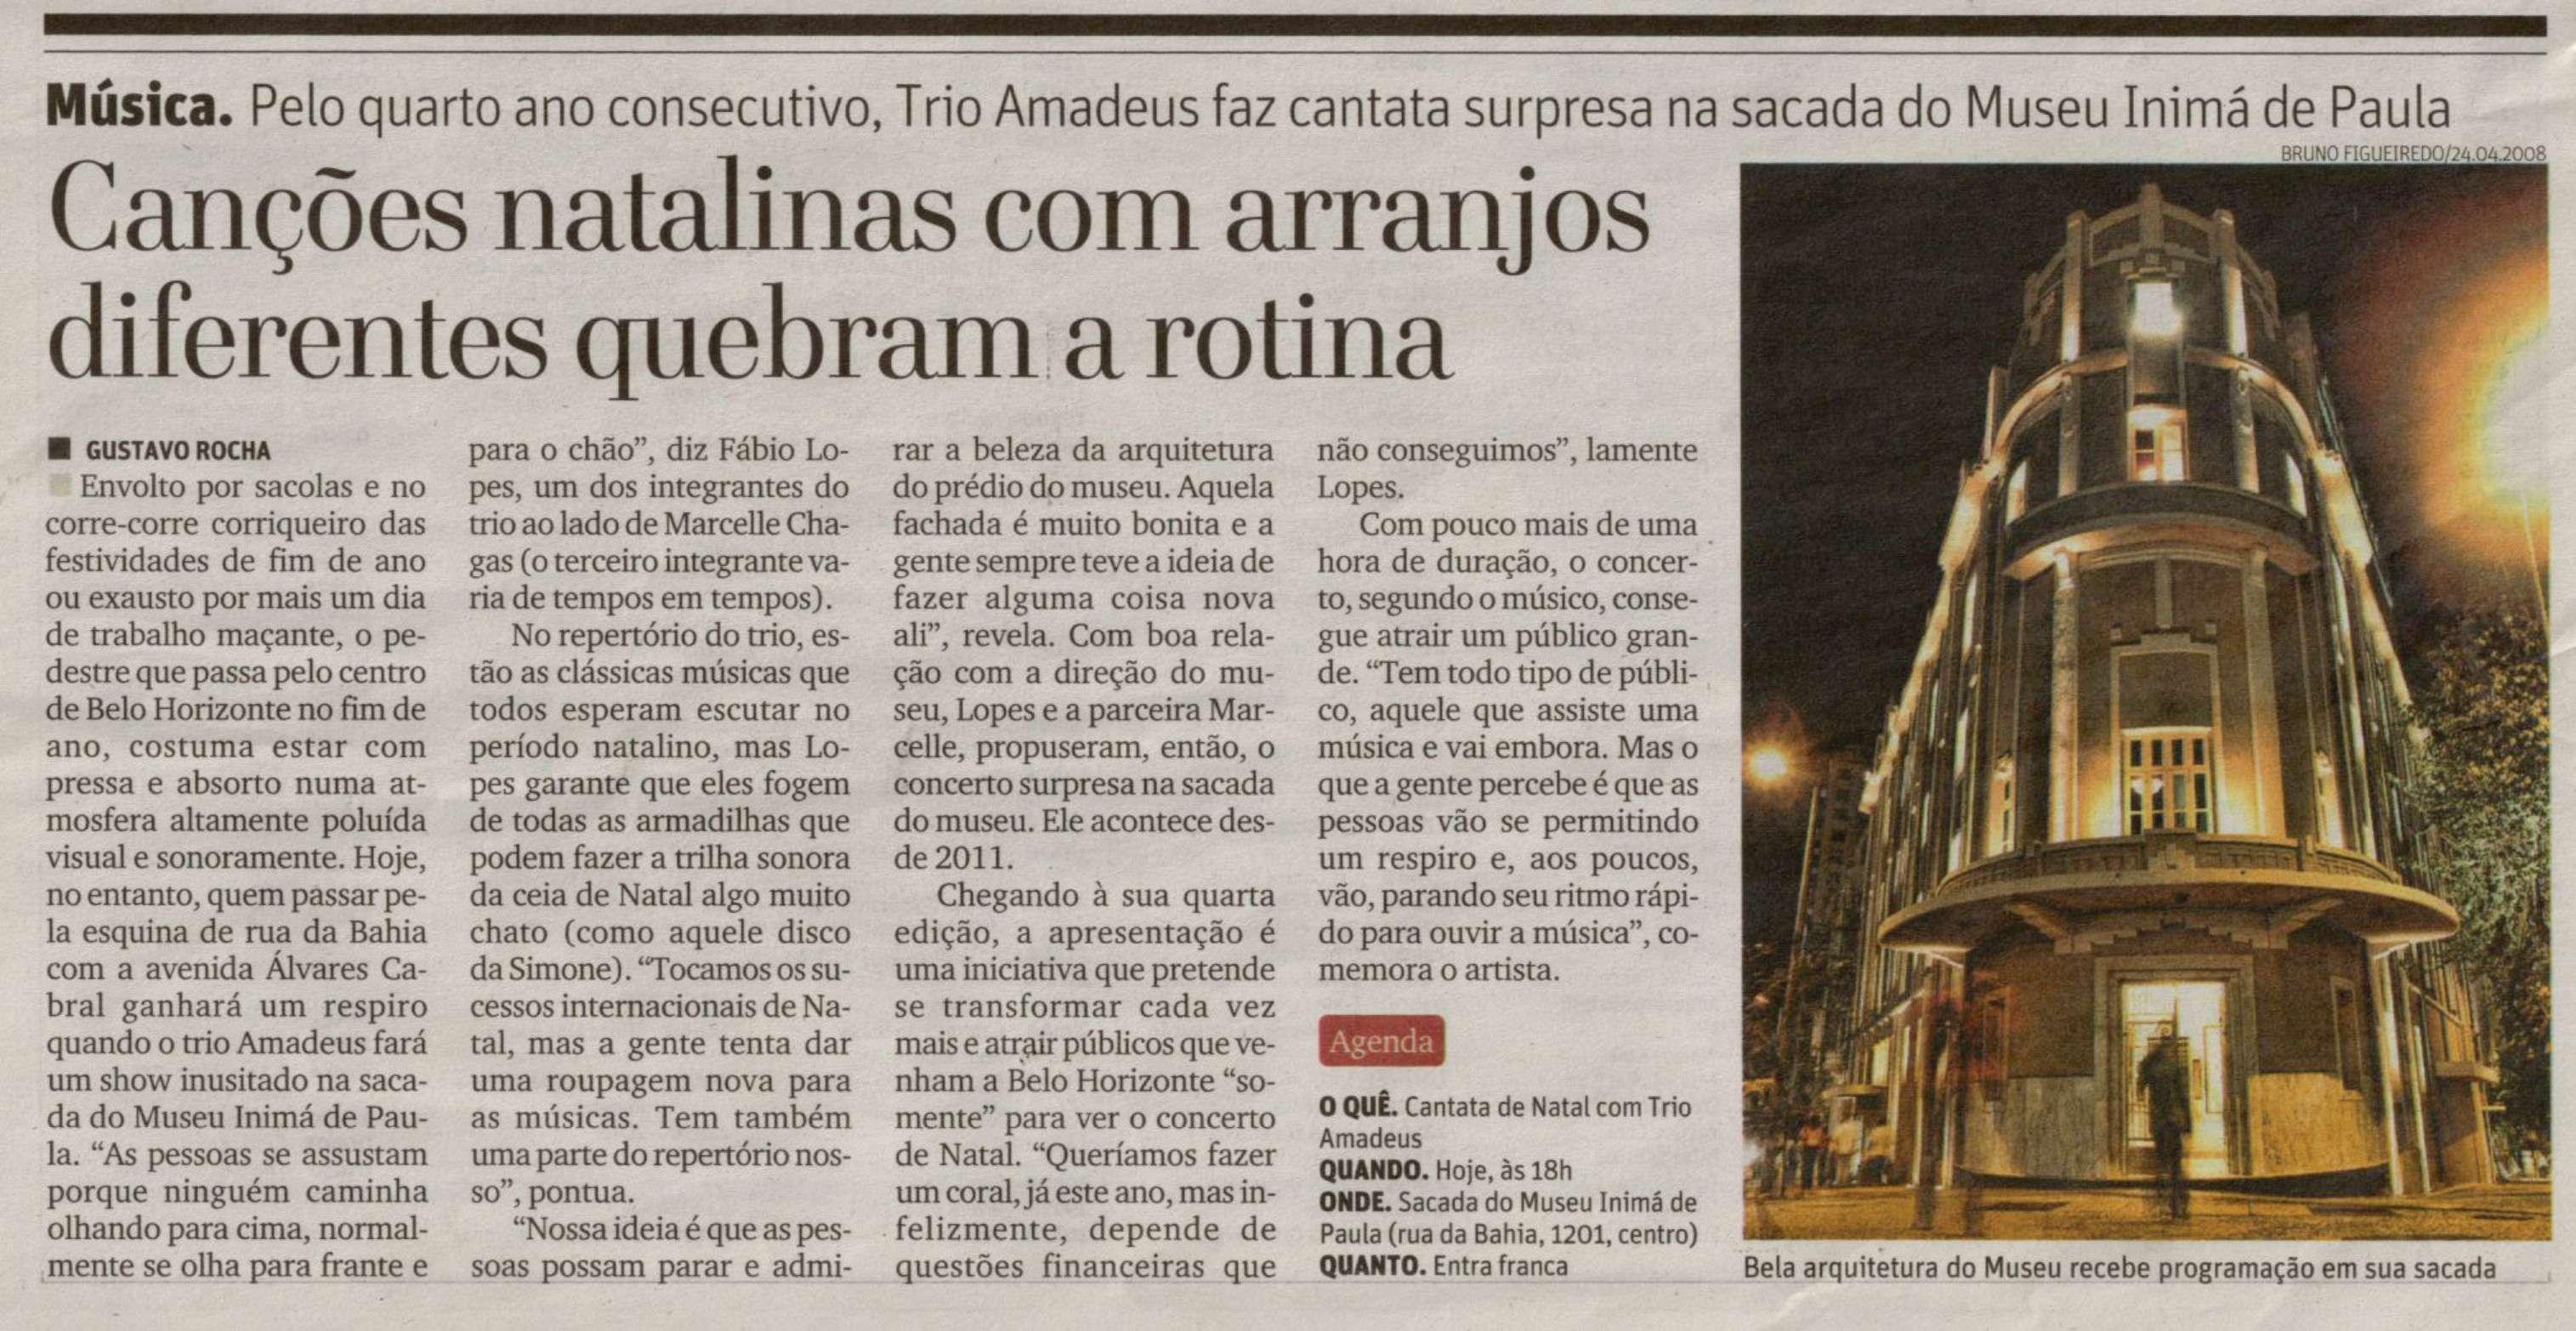 Inim+í_de_Paula_-_Jornal_O_Tempo_-_16-12-2014.jpg